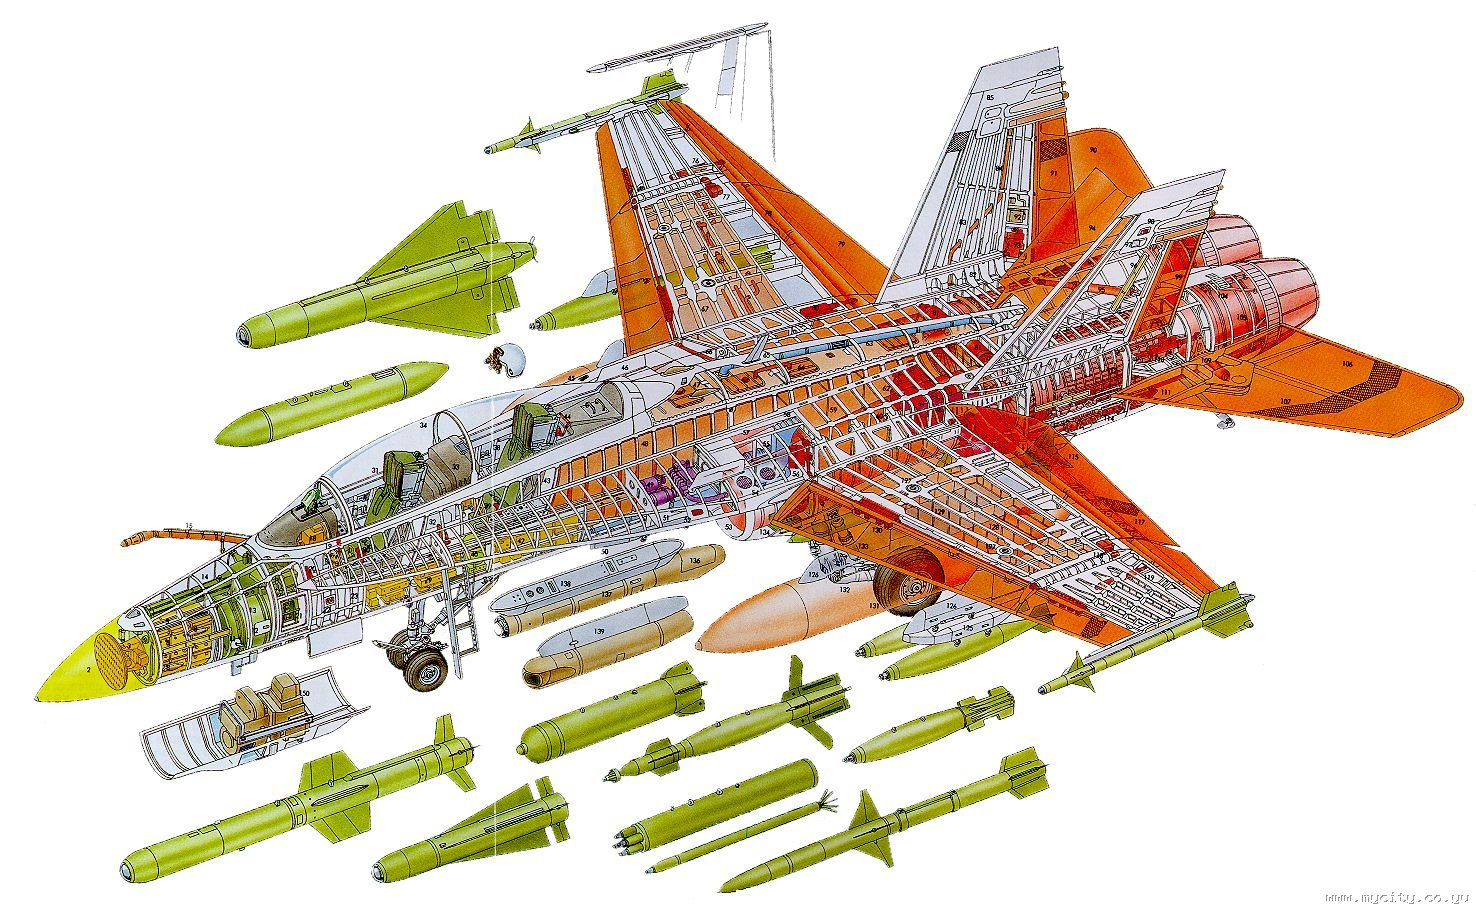 Aircraft Drawings Cutaways And Blueprints On Pinterest Cutaway